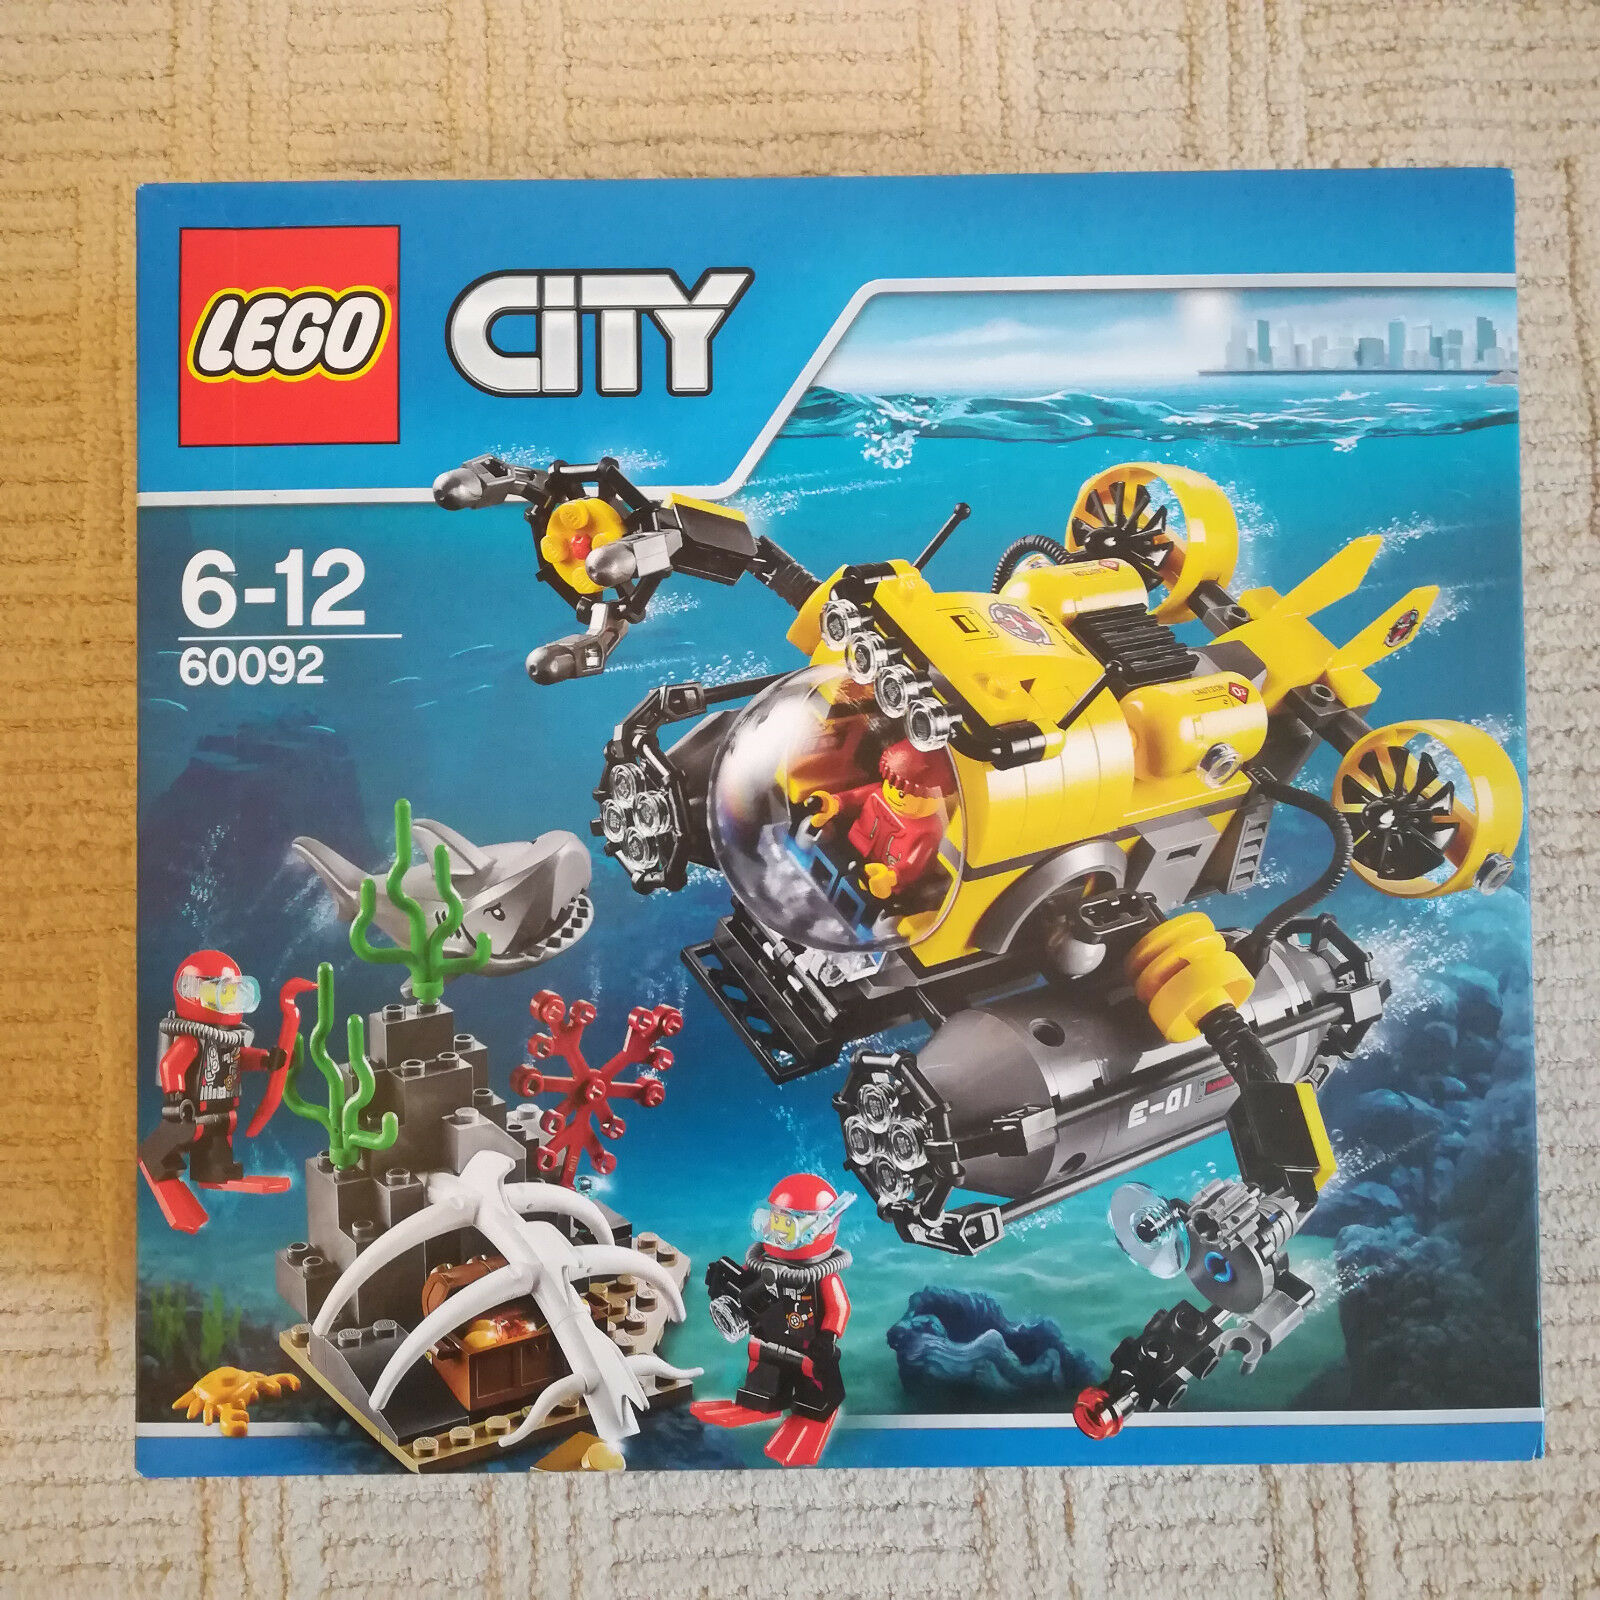 LEGO City 60092 DEEP SEA SUBMARINE - Brand New - Deep Sea Explorers